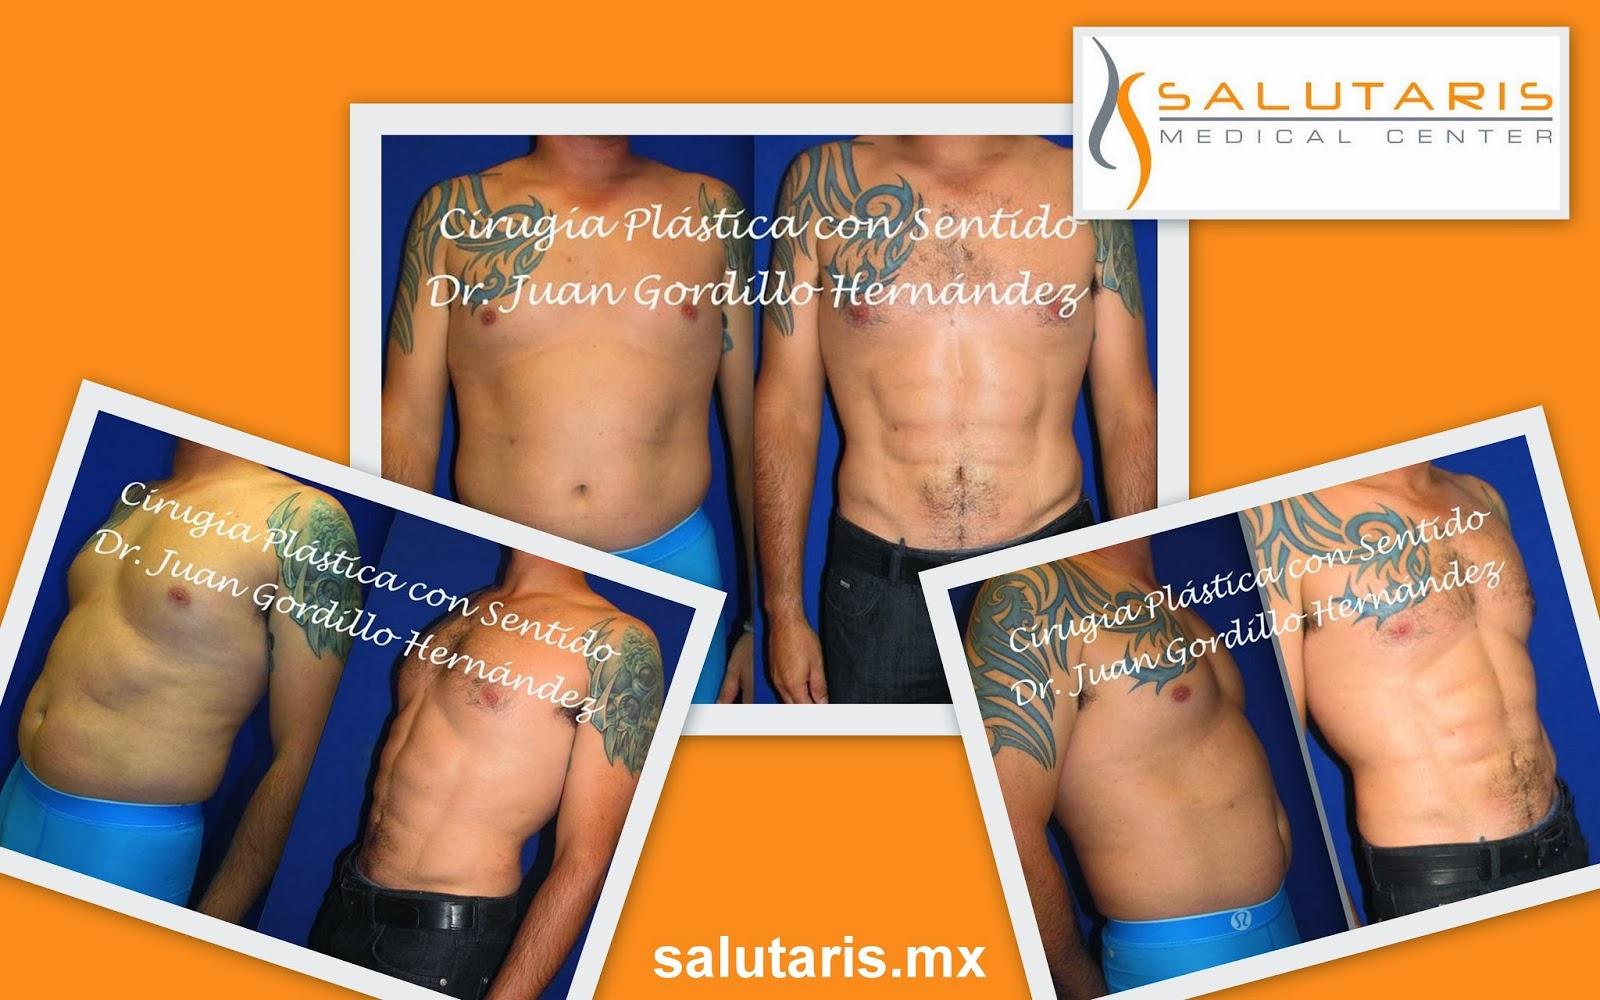 marcaje abdominal con lipolaser laser liposuccion precio costo guadalajara mexico